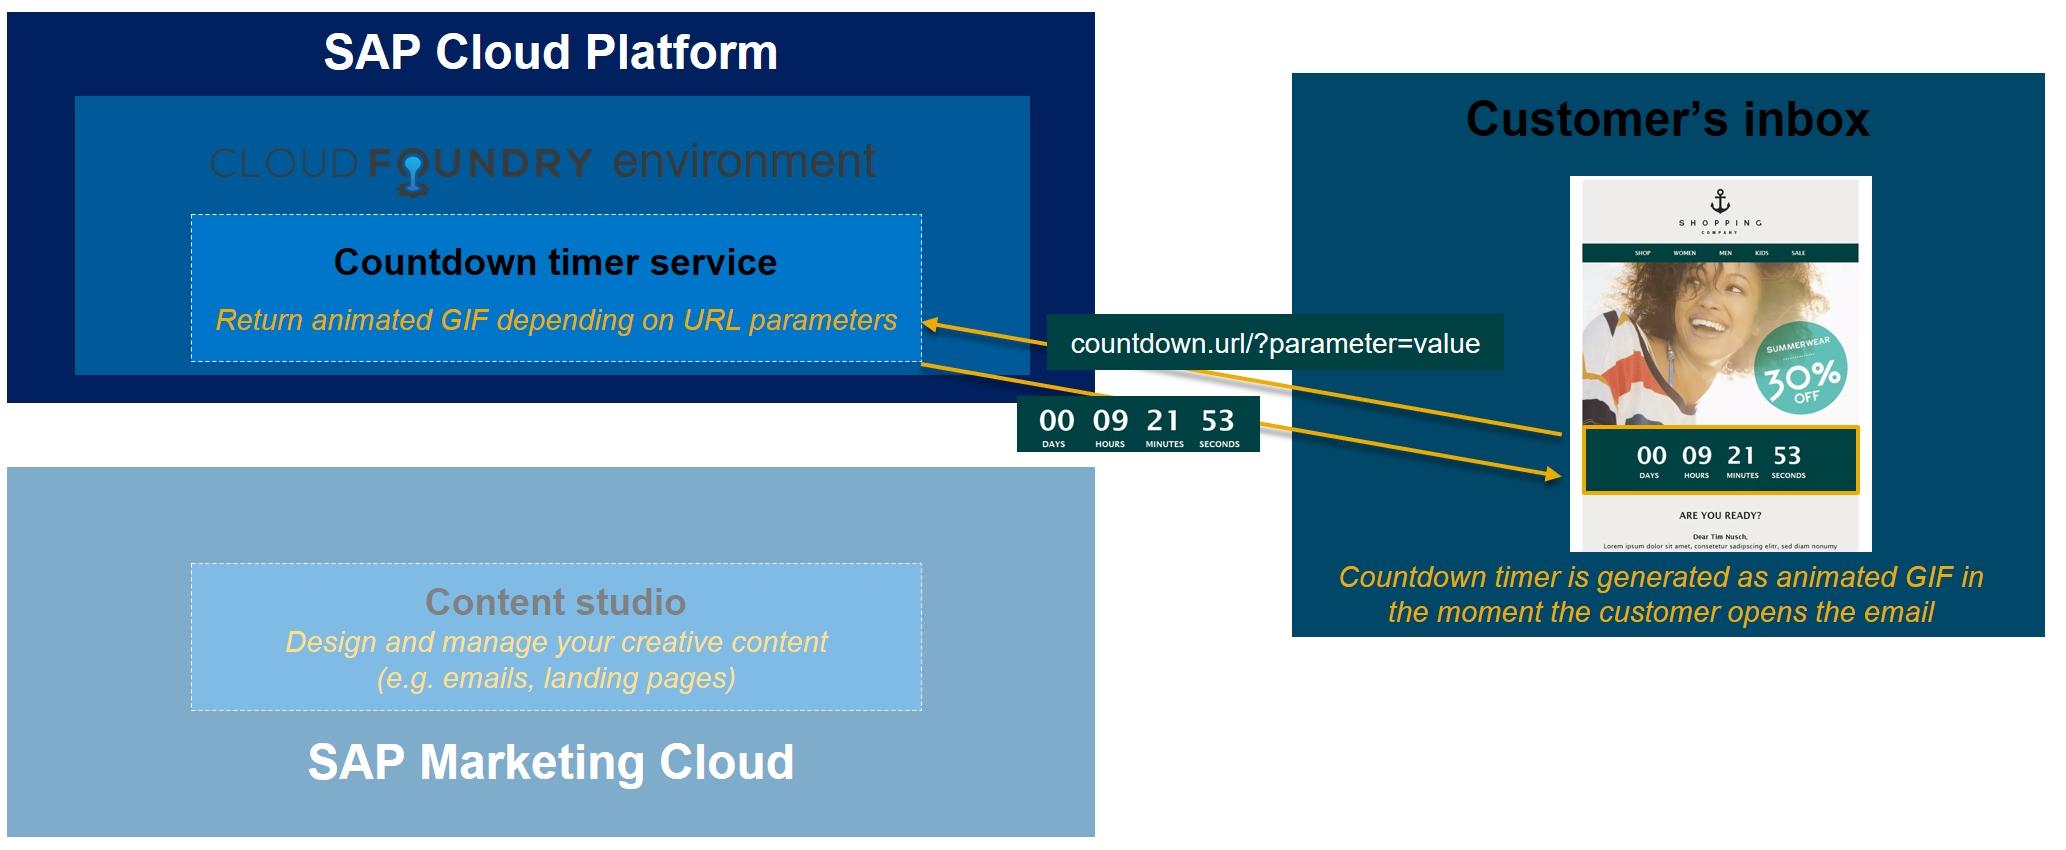 Build Your Email Countdown Timer For Sap Marketing Cloud On Sap Cloud Platform | Sap Blogs intended for Deployment Countdown Calendar 2018 Photo